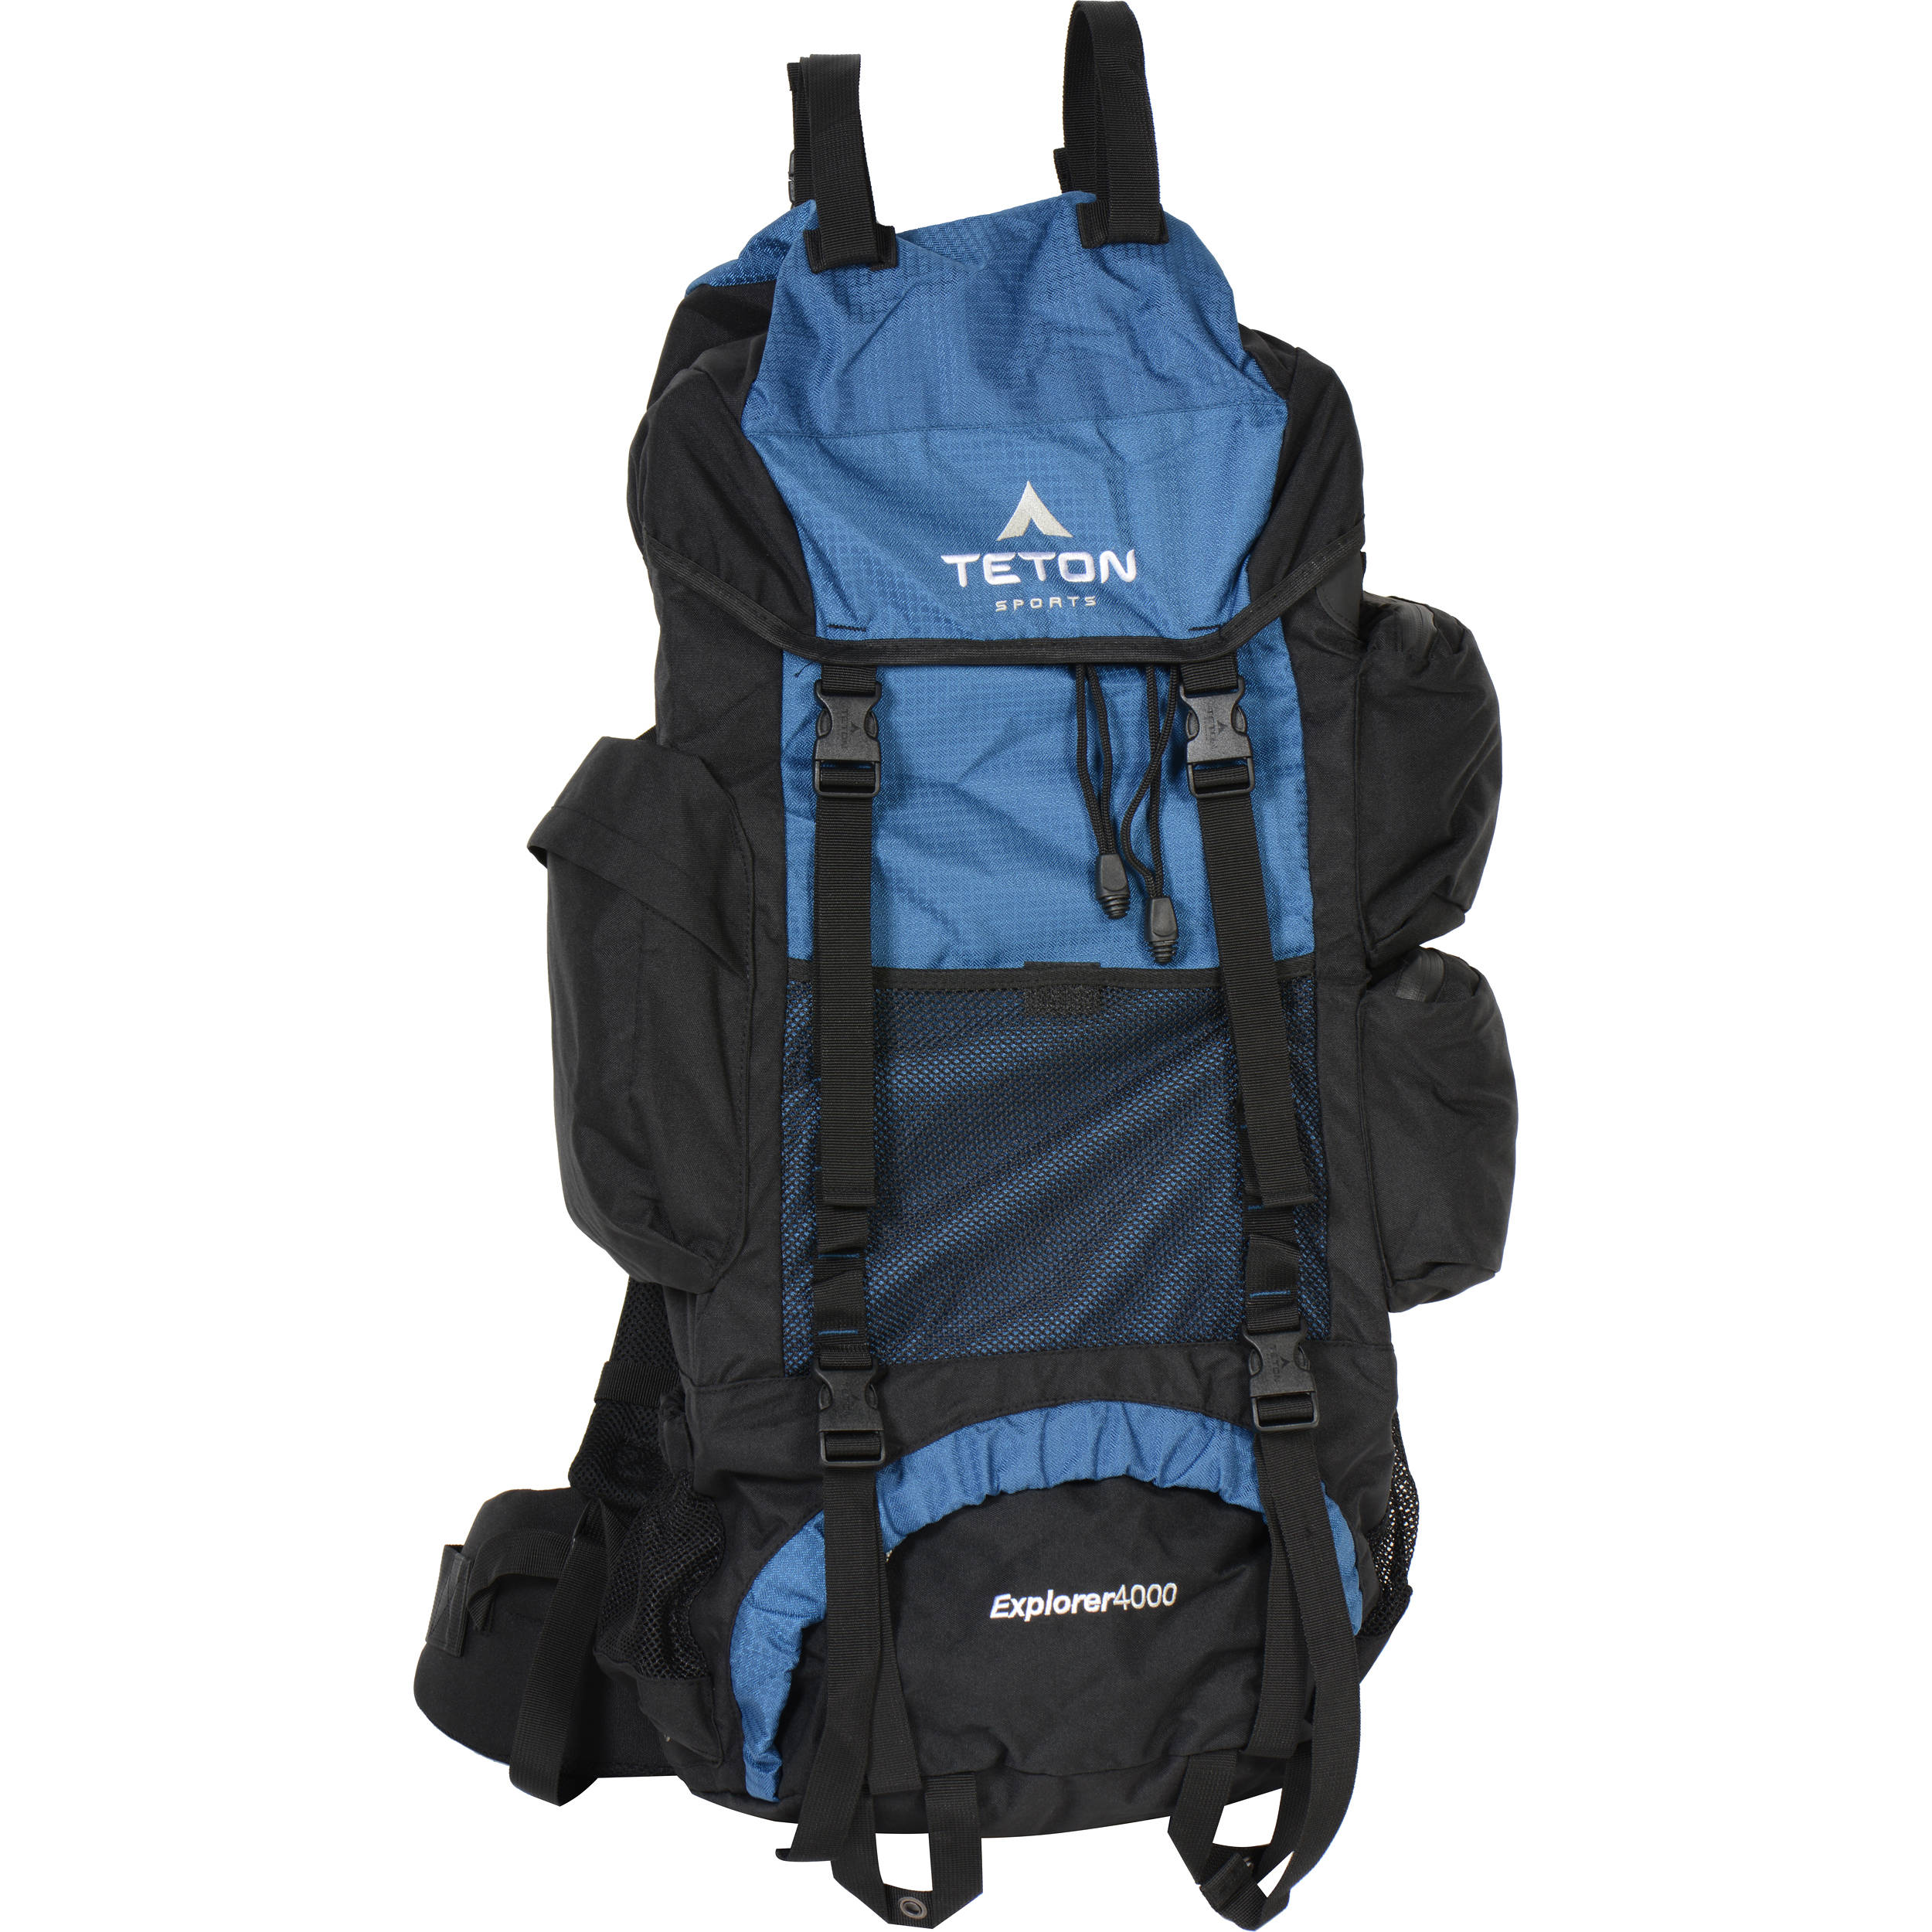 TETON Sports Explorer4000 Internal Frame Backpack (Navy Blue) 8ef2c2a2226a6